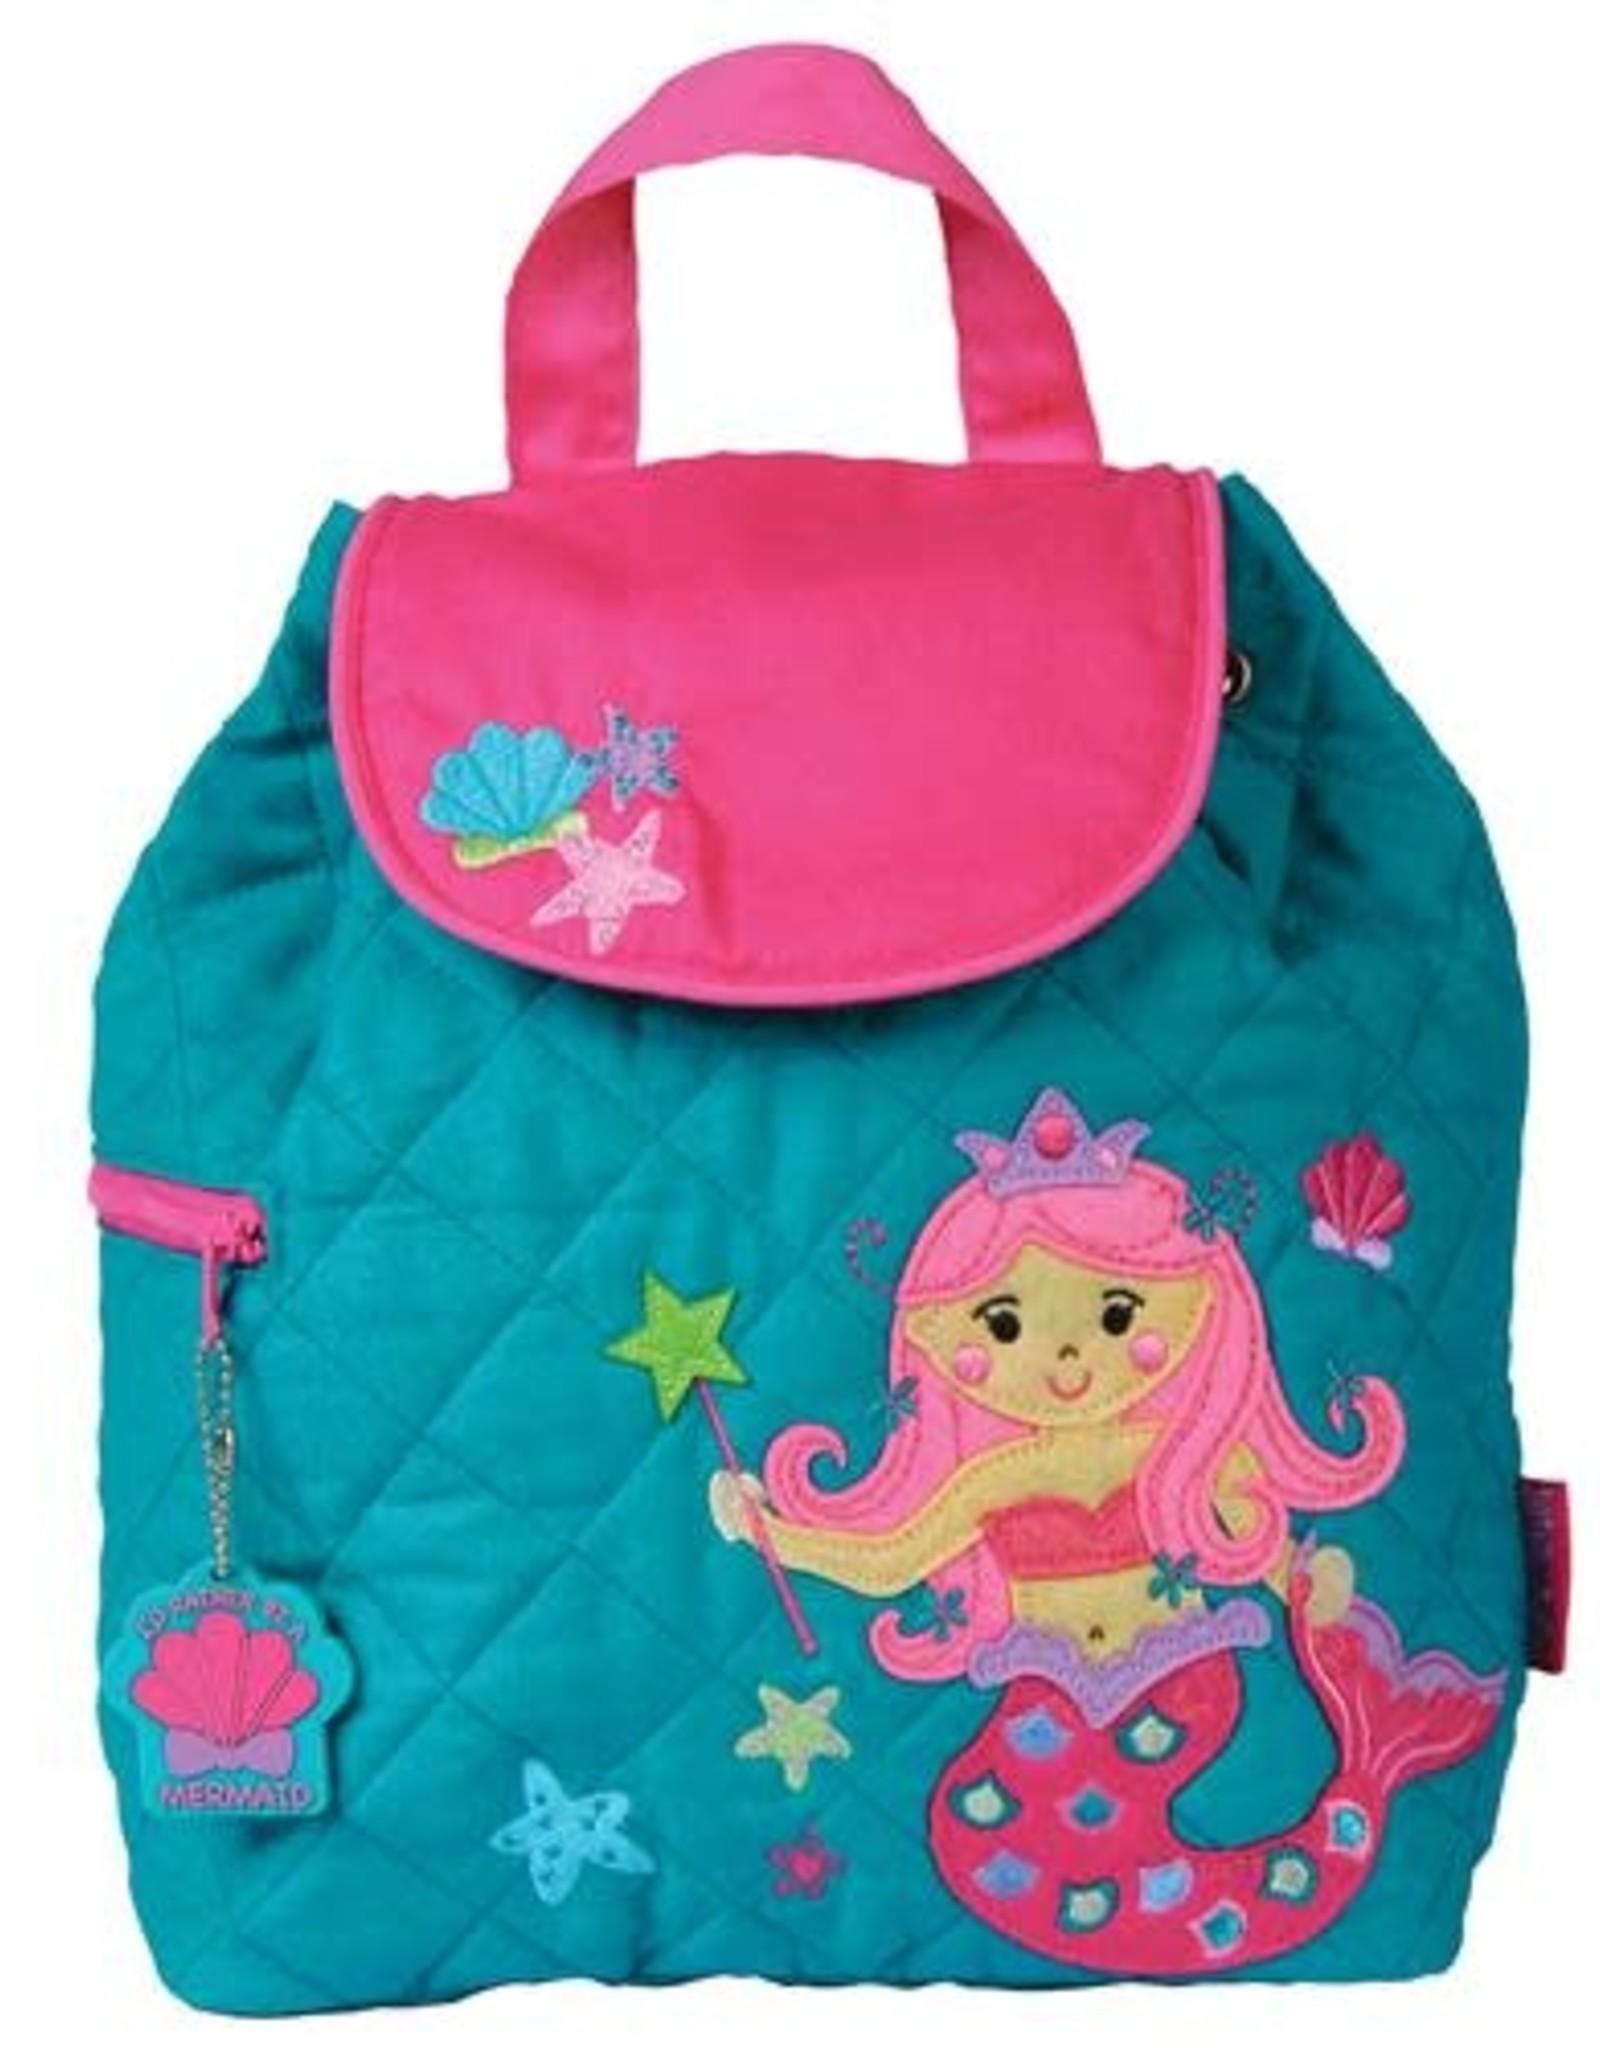 Stephen Joseph Backpack Mermaid